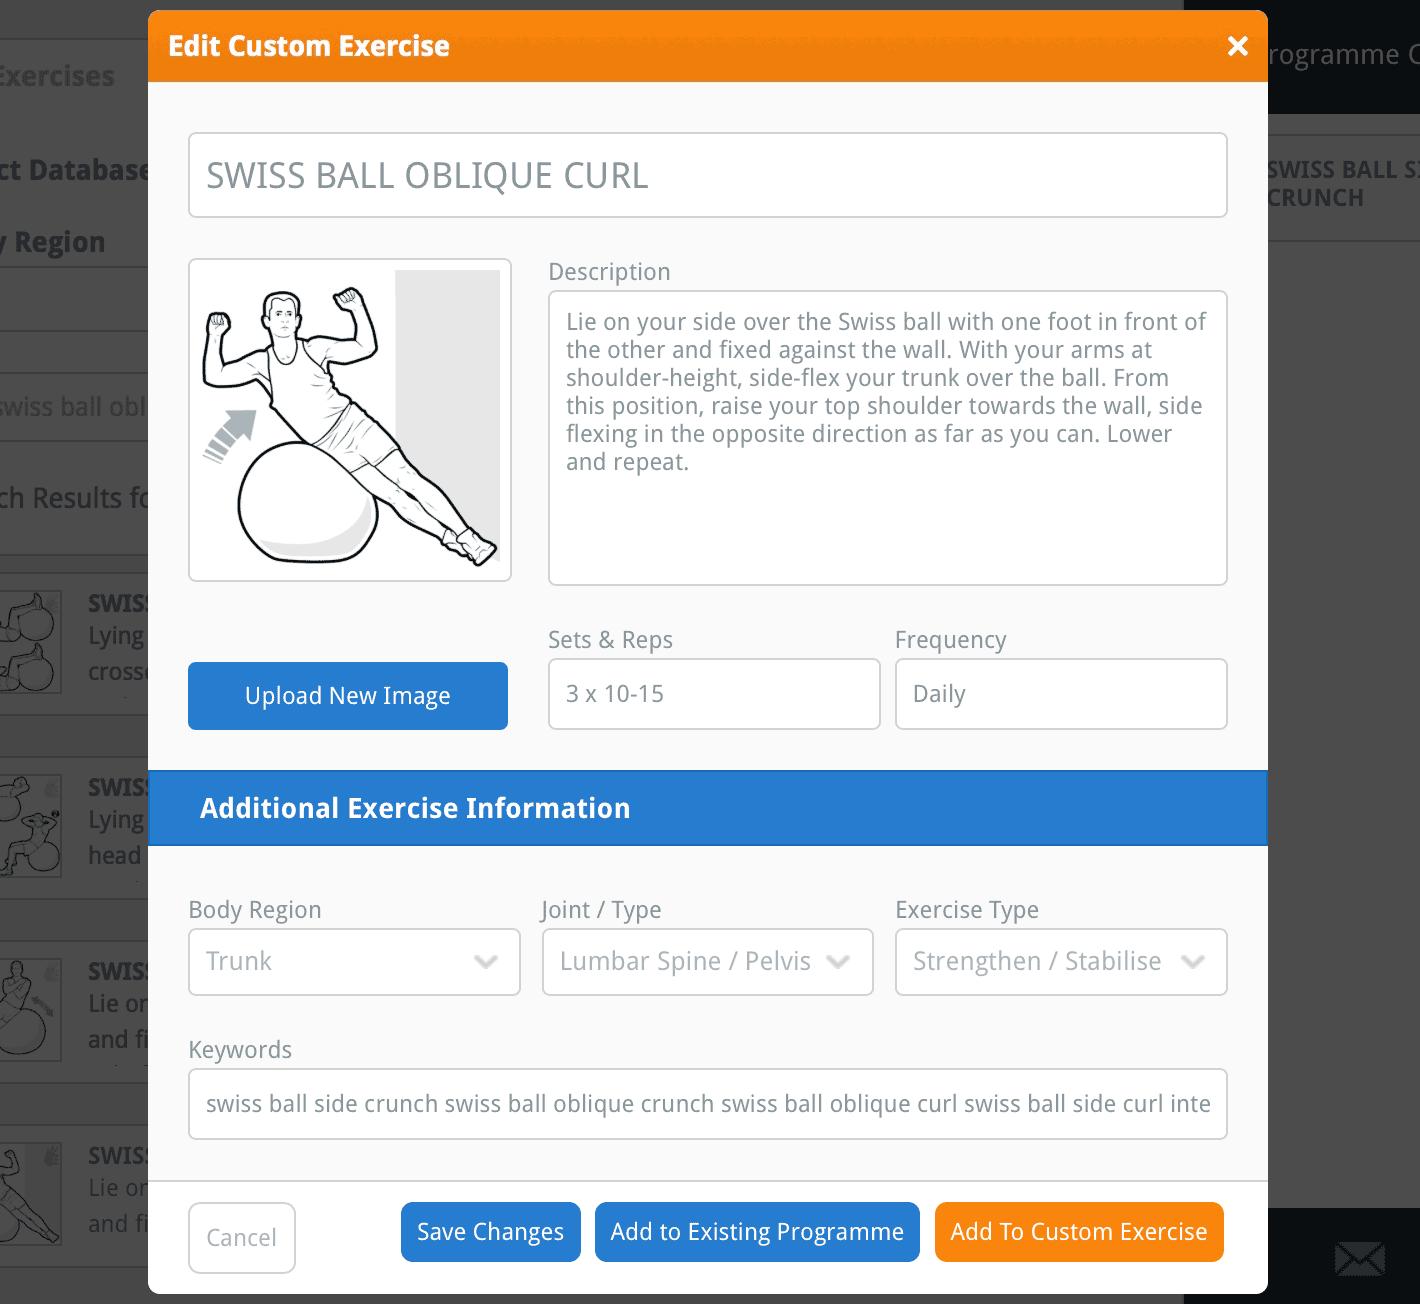 Edit Custom Exercise window